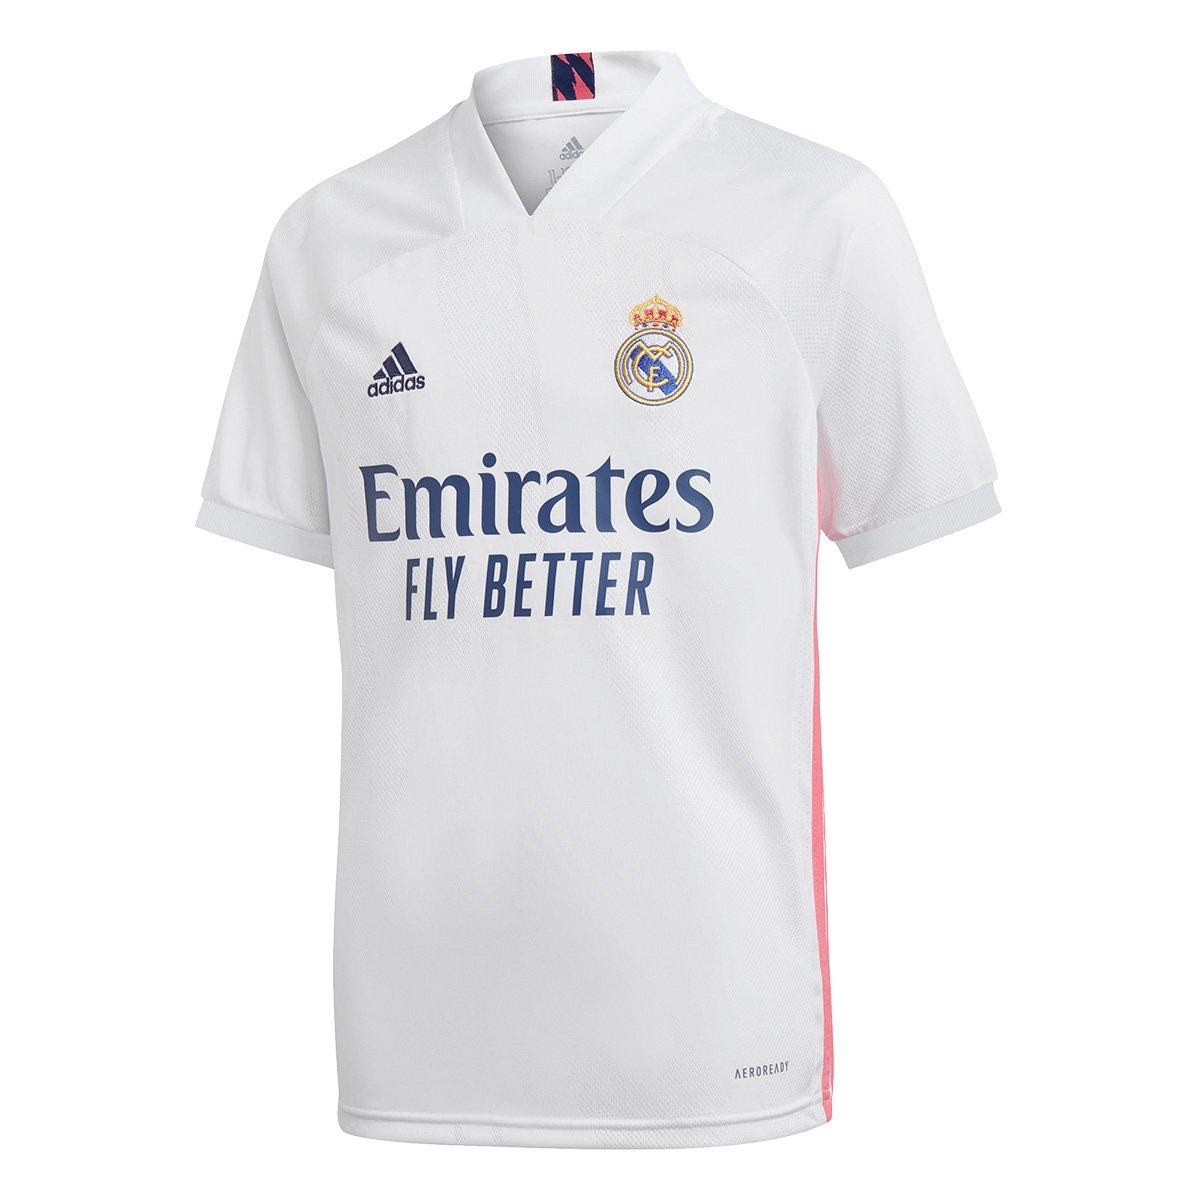 Camisa Real Madrid Juvenil Home 20/21 s/n° Torcedor Adidas